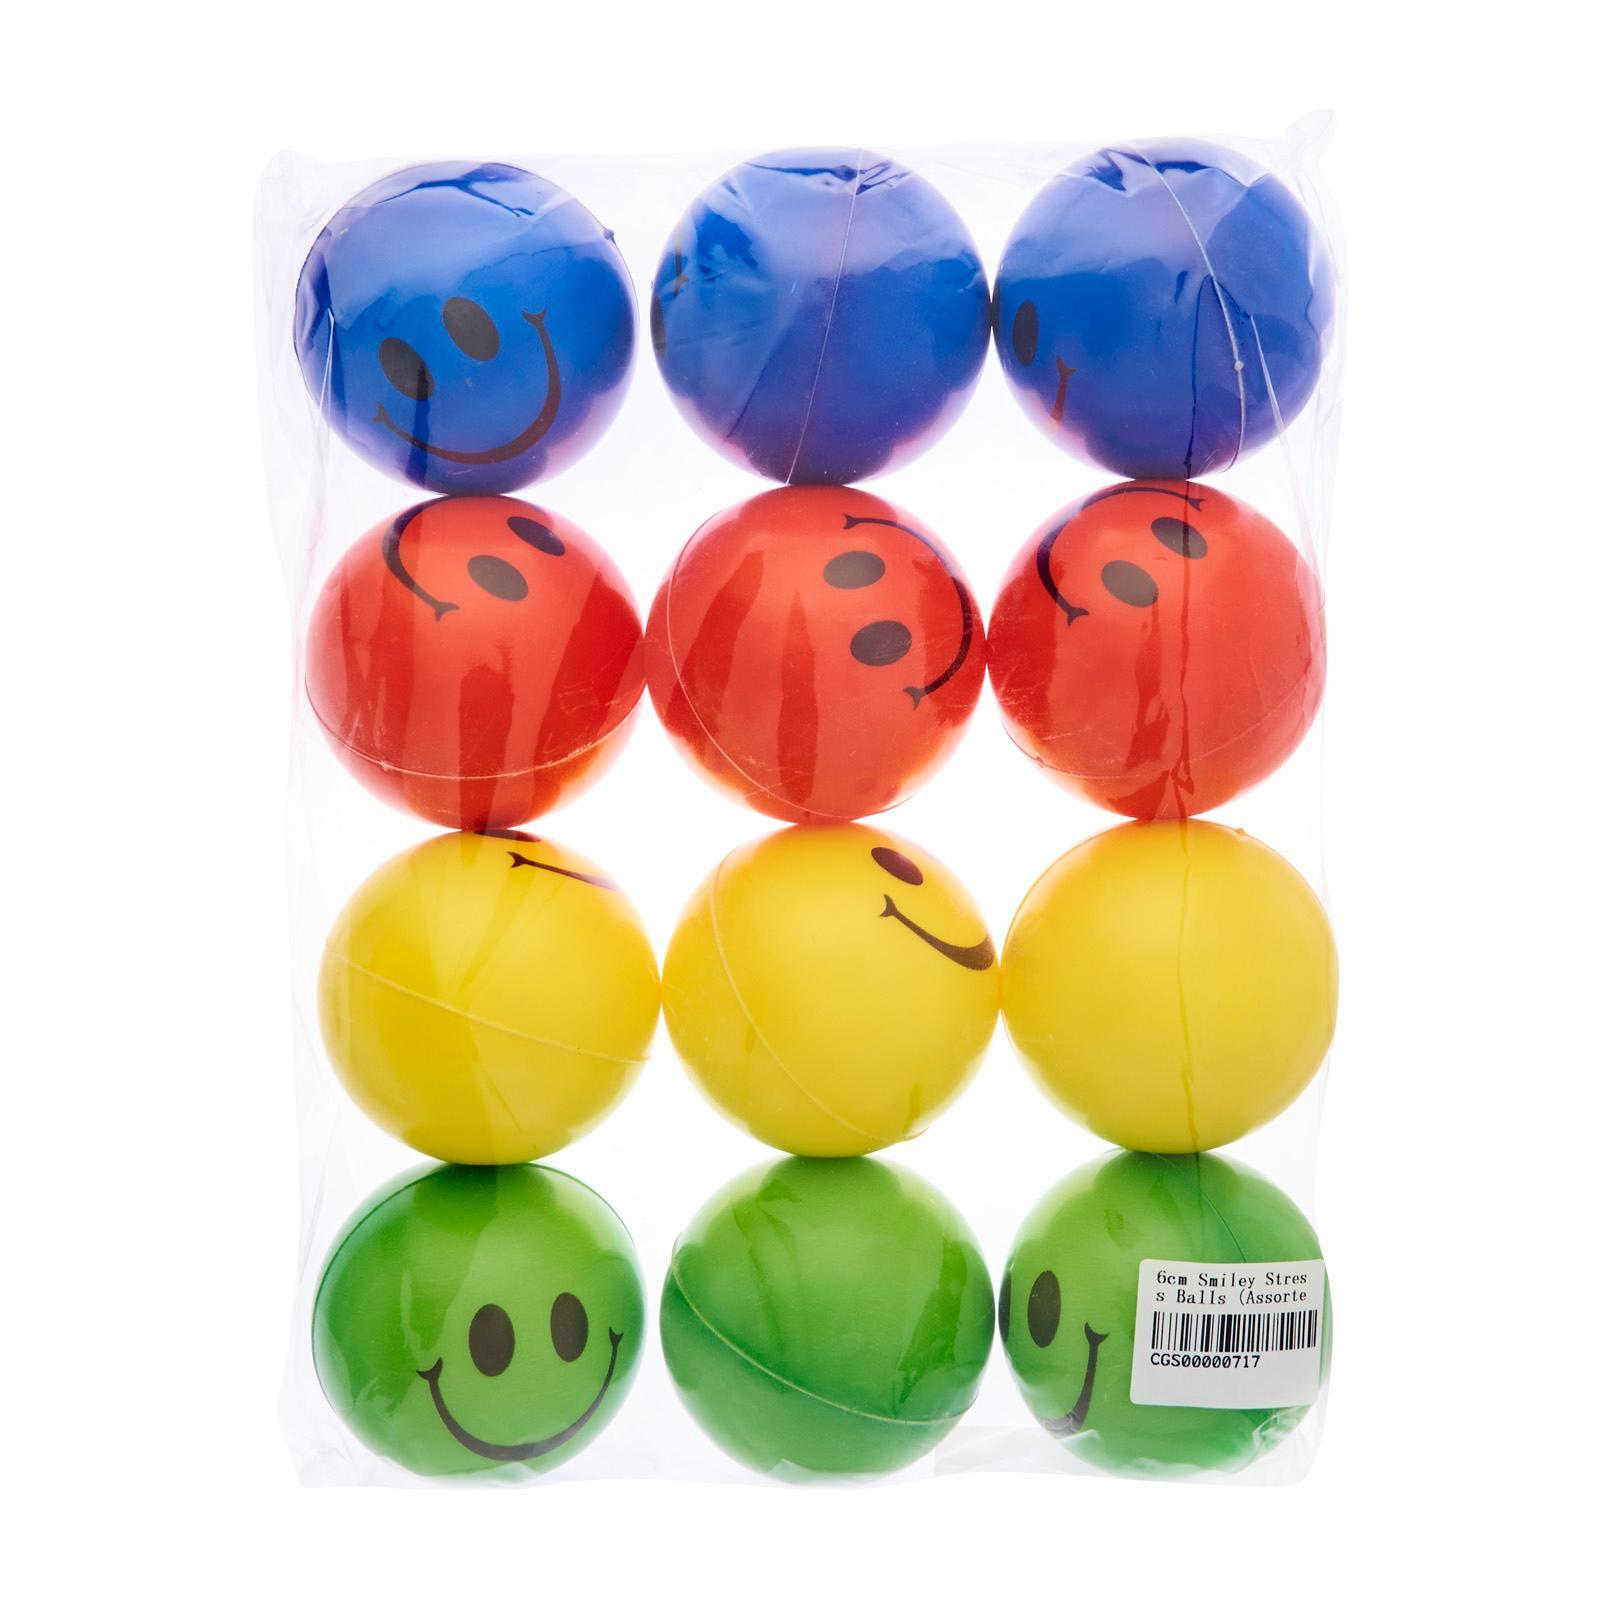 CGS 6Cm Smiley Stress Balls (Assorted) (12Pcs) - Party Favor